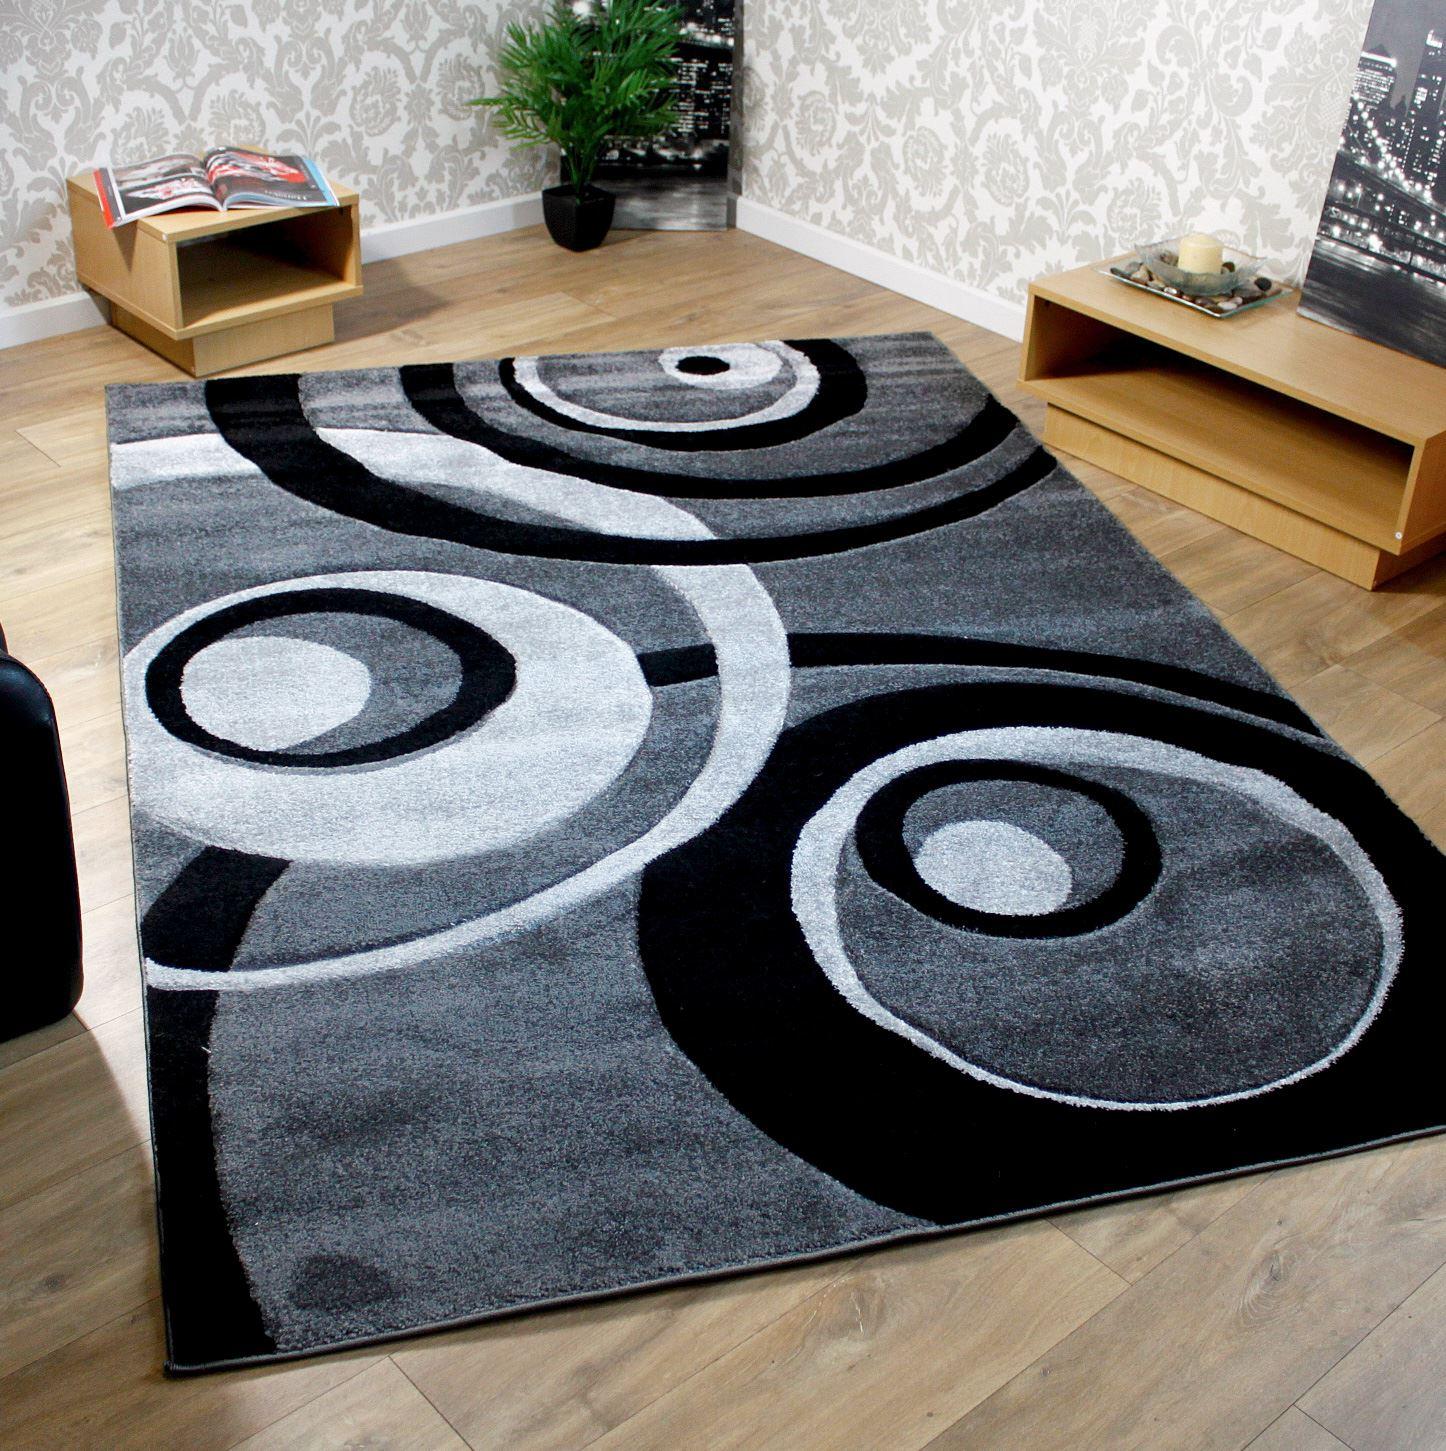 Home furniture diy rugs carpets rugs